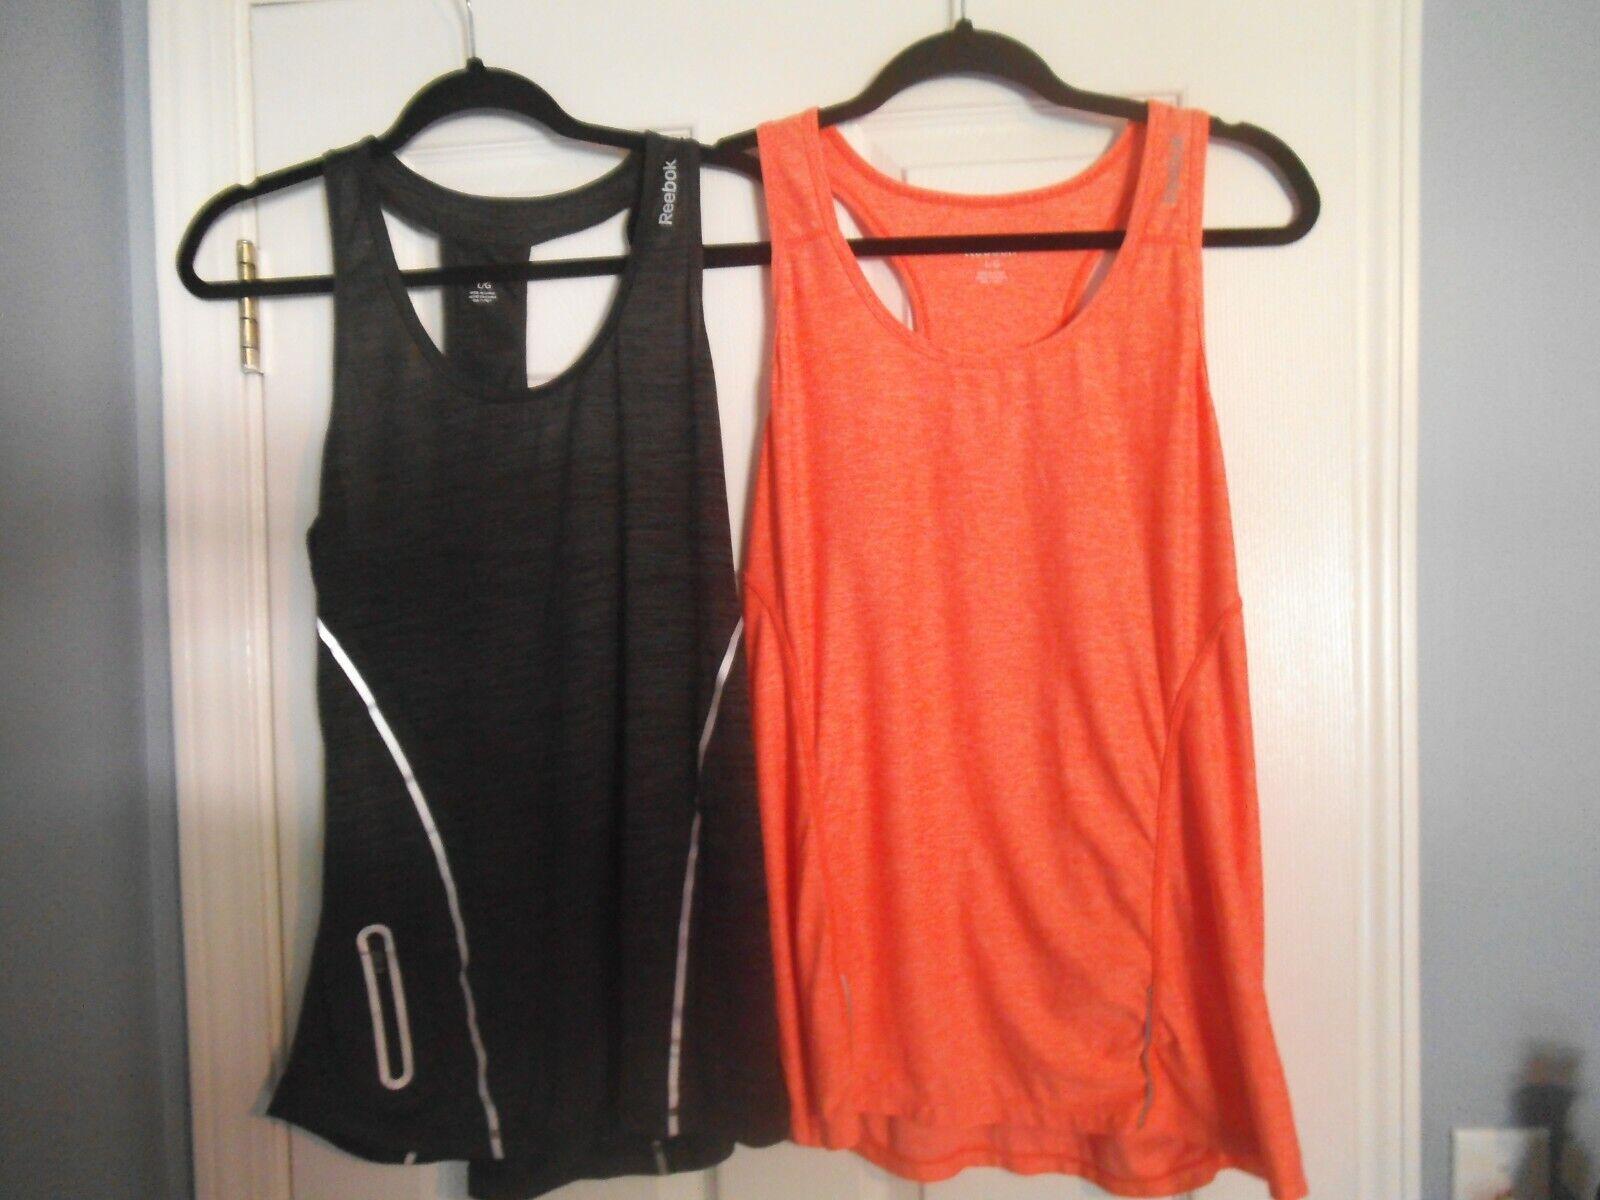 2 -Reebok Women's Tank Tops Size LG Mesh Stretch Racer Back Activewear * LOOK *